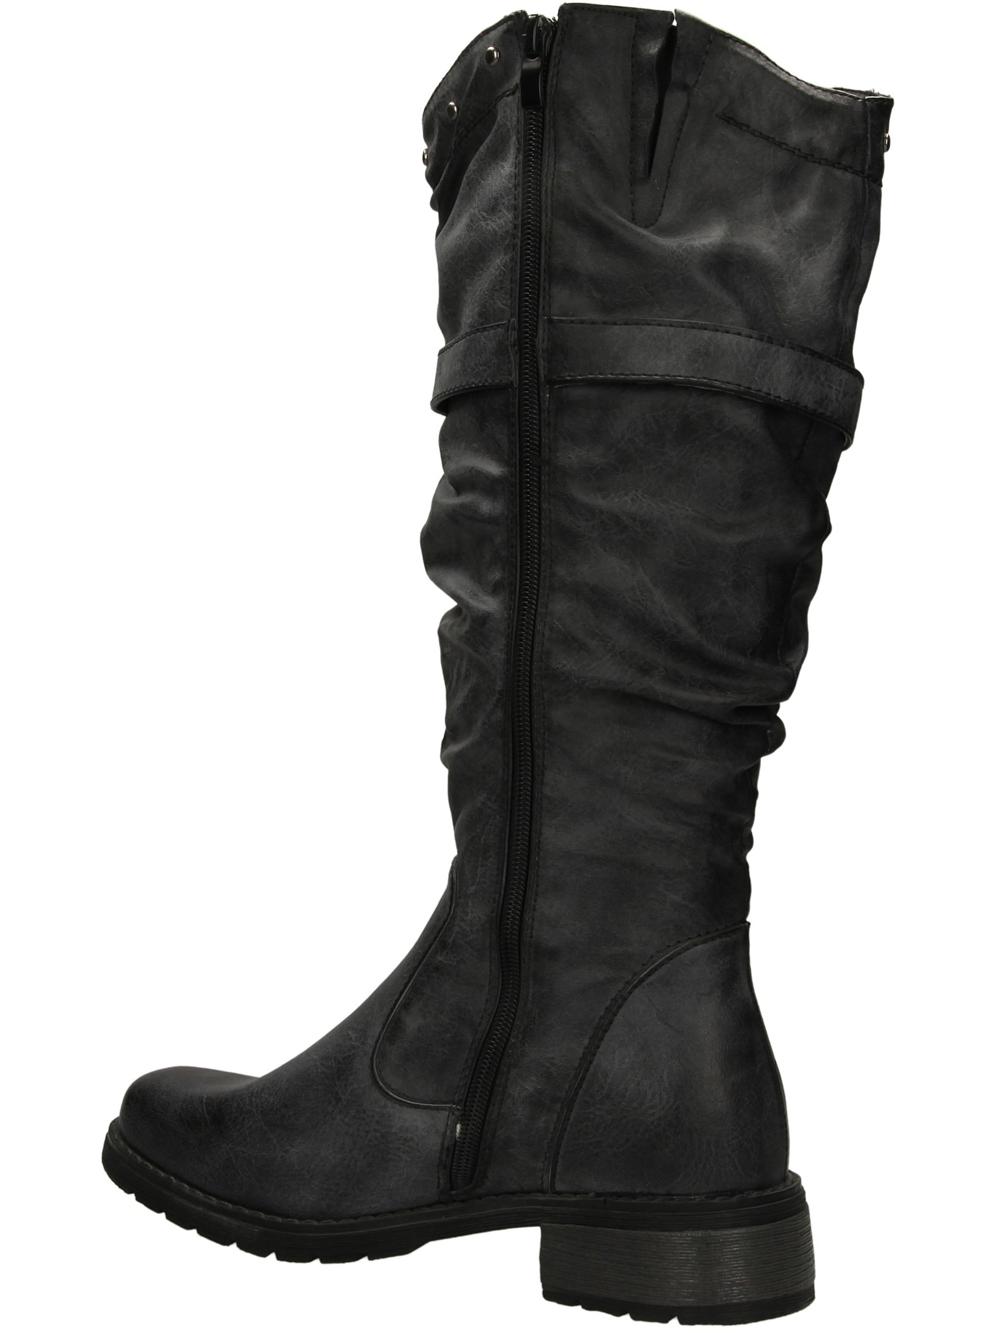 KOZAKI S.BARSKI SB5067-7 kolor czarny